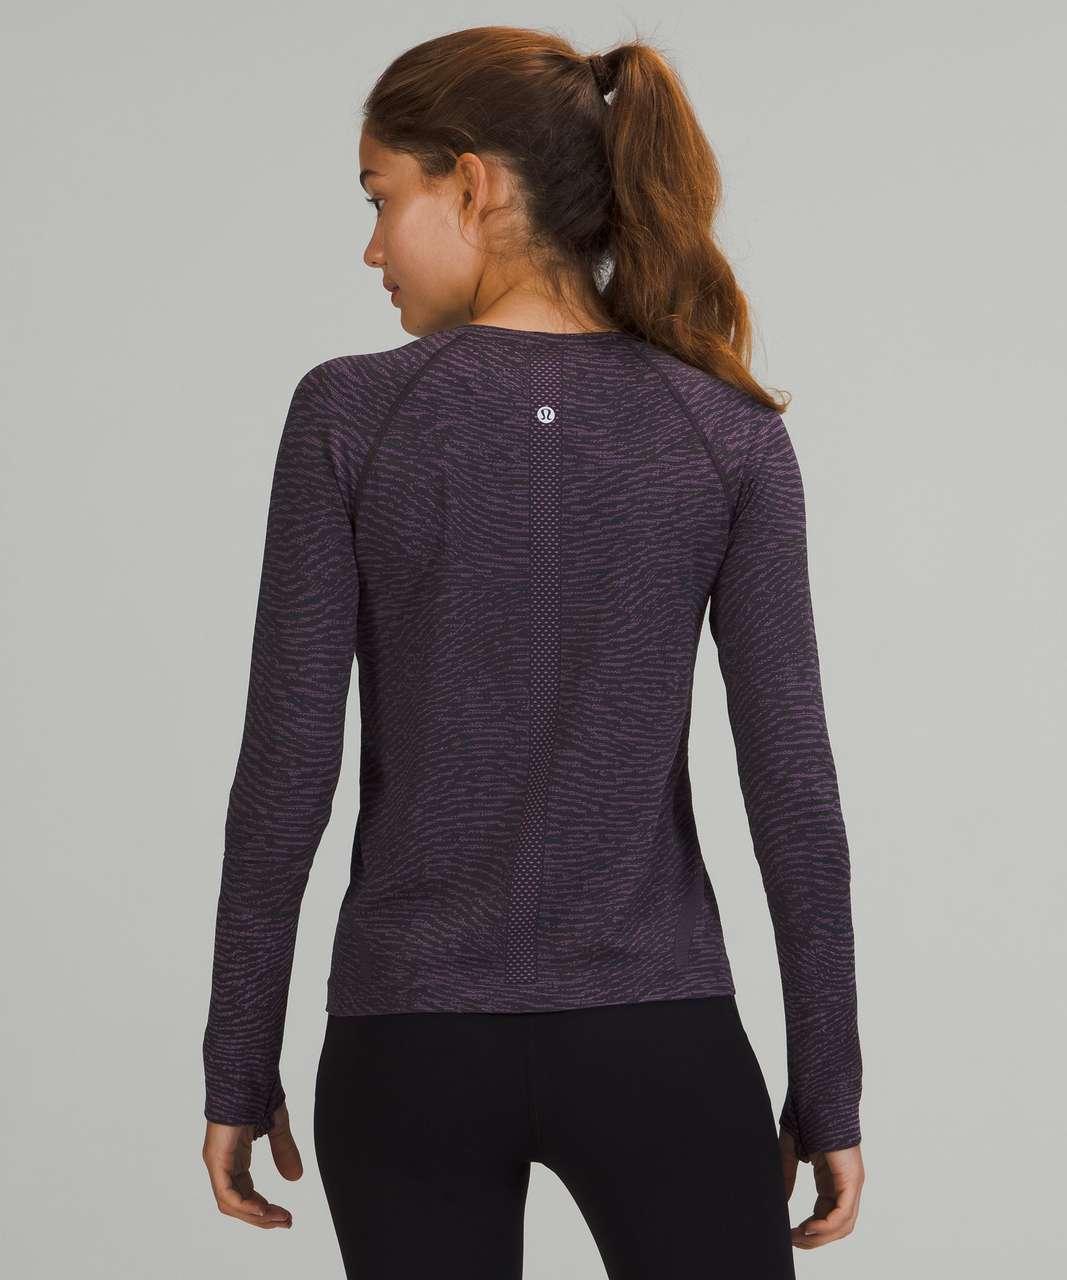 Lululemon Swiftly Tech Long Sleeve Shirt 2.0 *Race Length - Water Surface Black Granite / Wisteria Purple